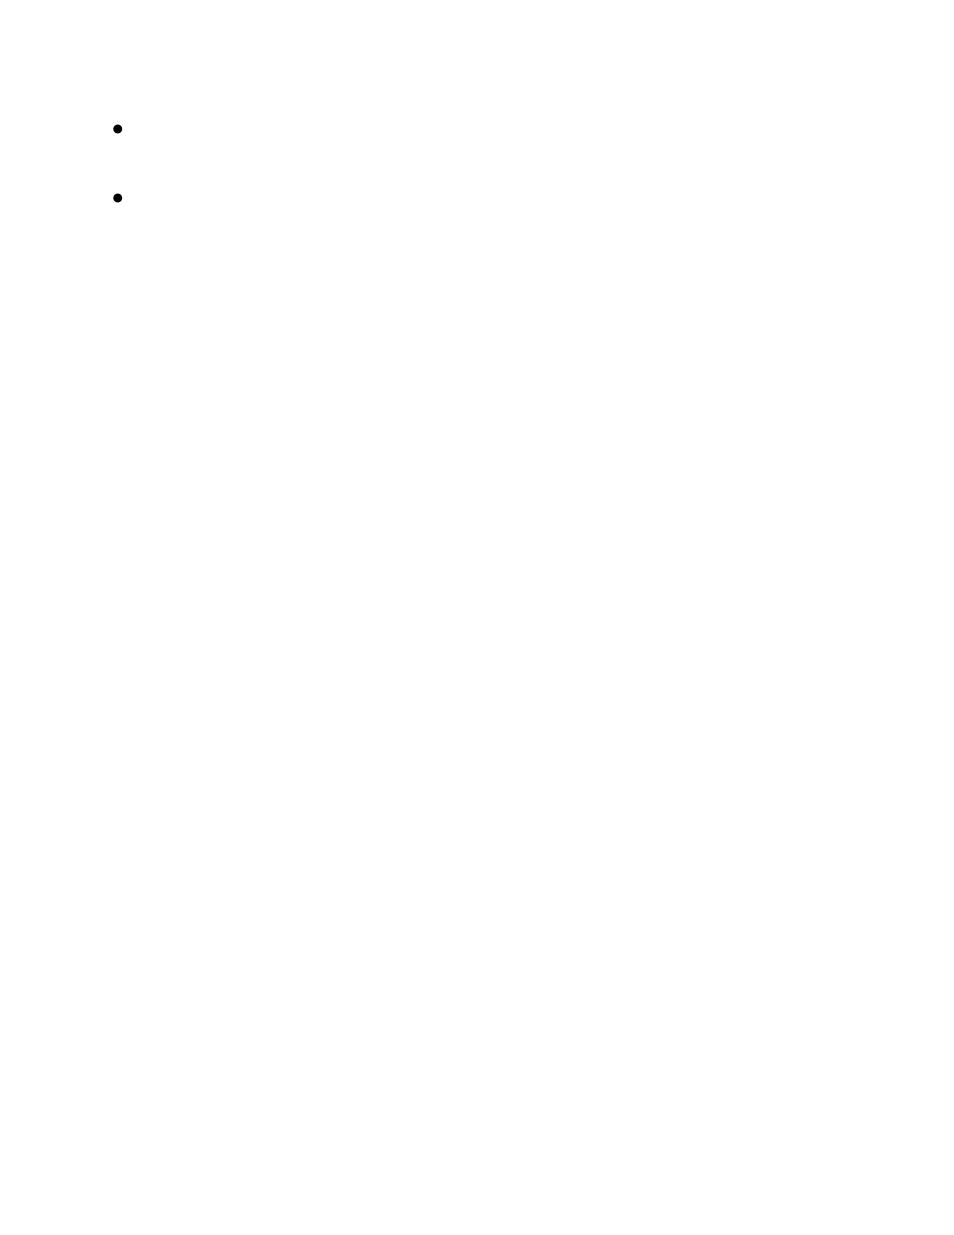 Toyota Tacoma 2015-2018 Service Manual: Air Inlet Damper Position Sensor Circuit (B143232)